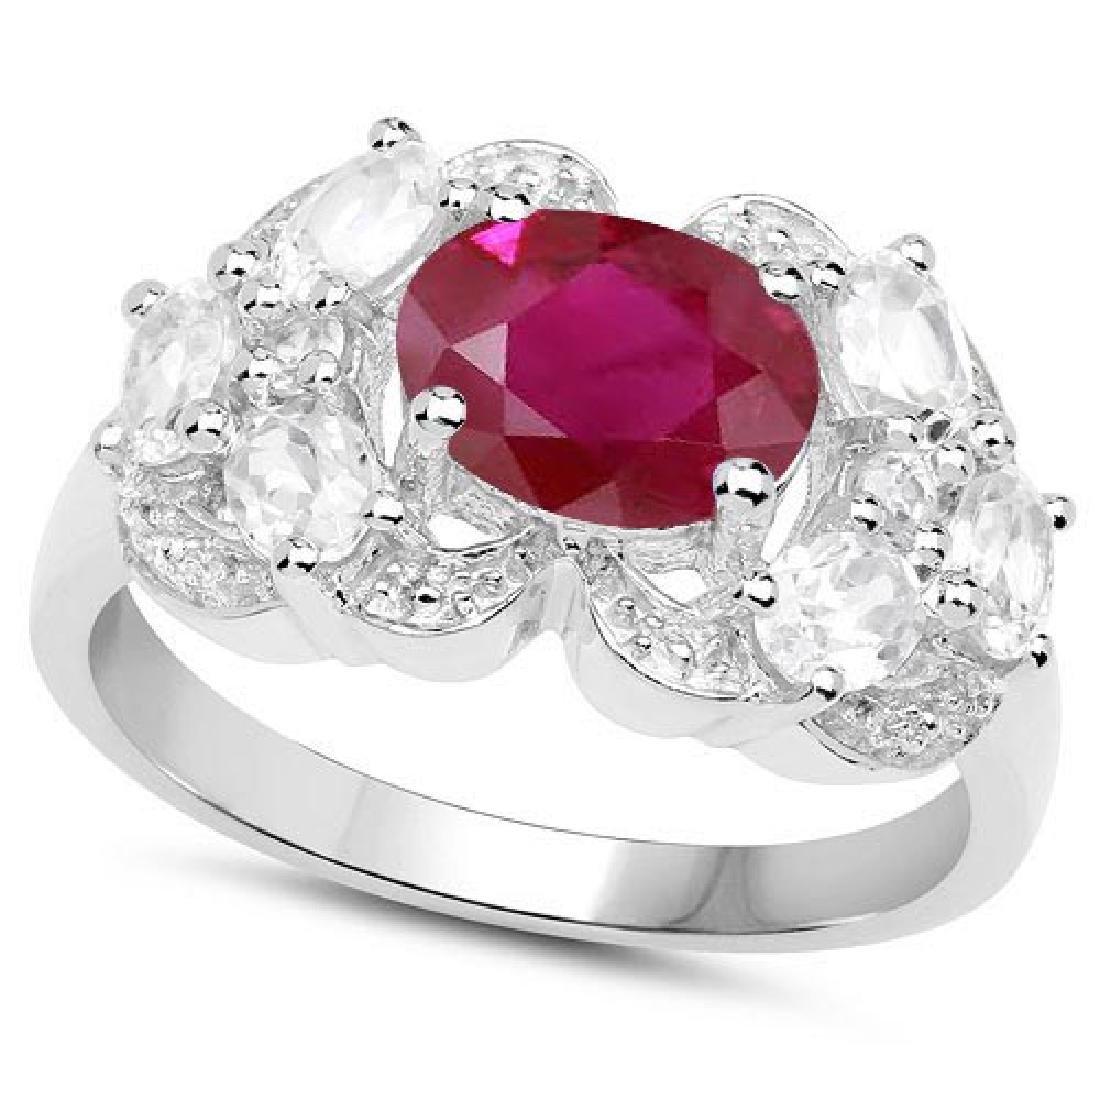 Certified 1.10 Ctw. Genuine Ruby And Diamond 14K White